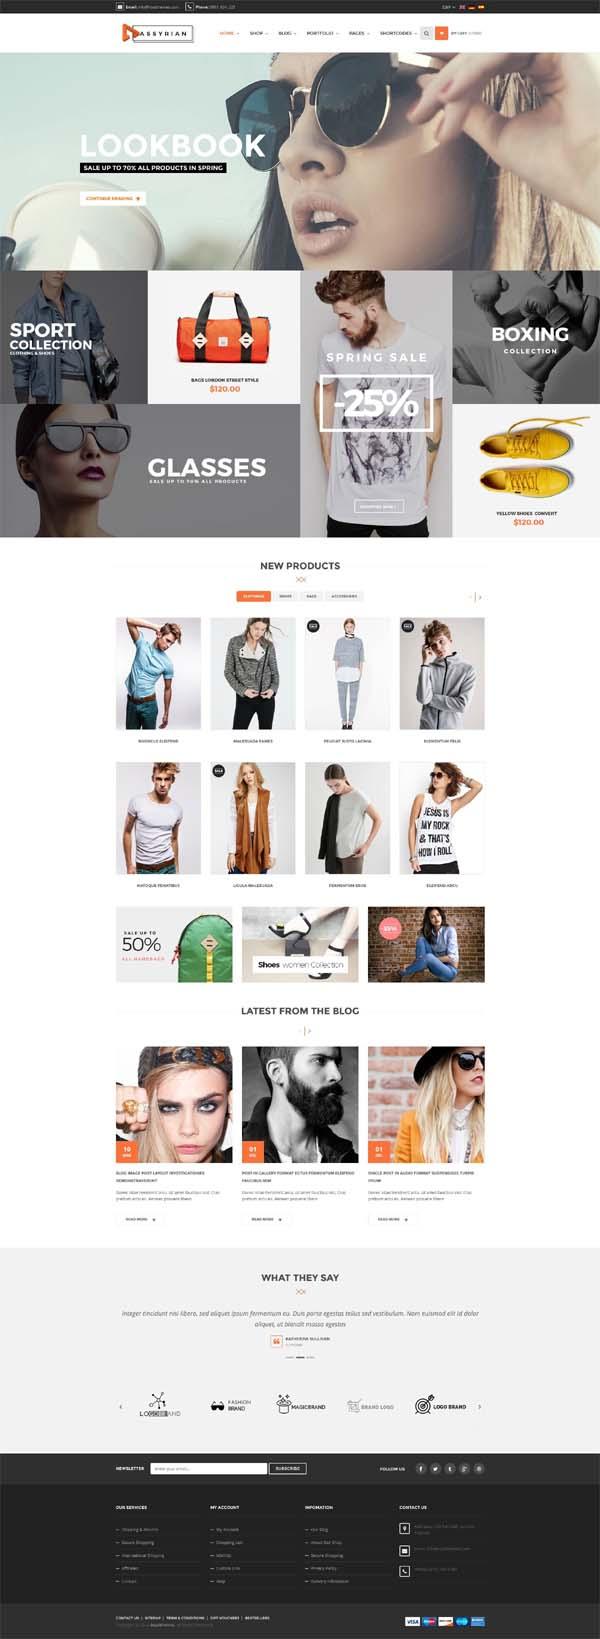 Assyrian – Responsive Fashion WordPress Theme